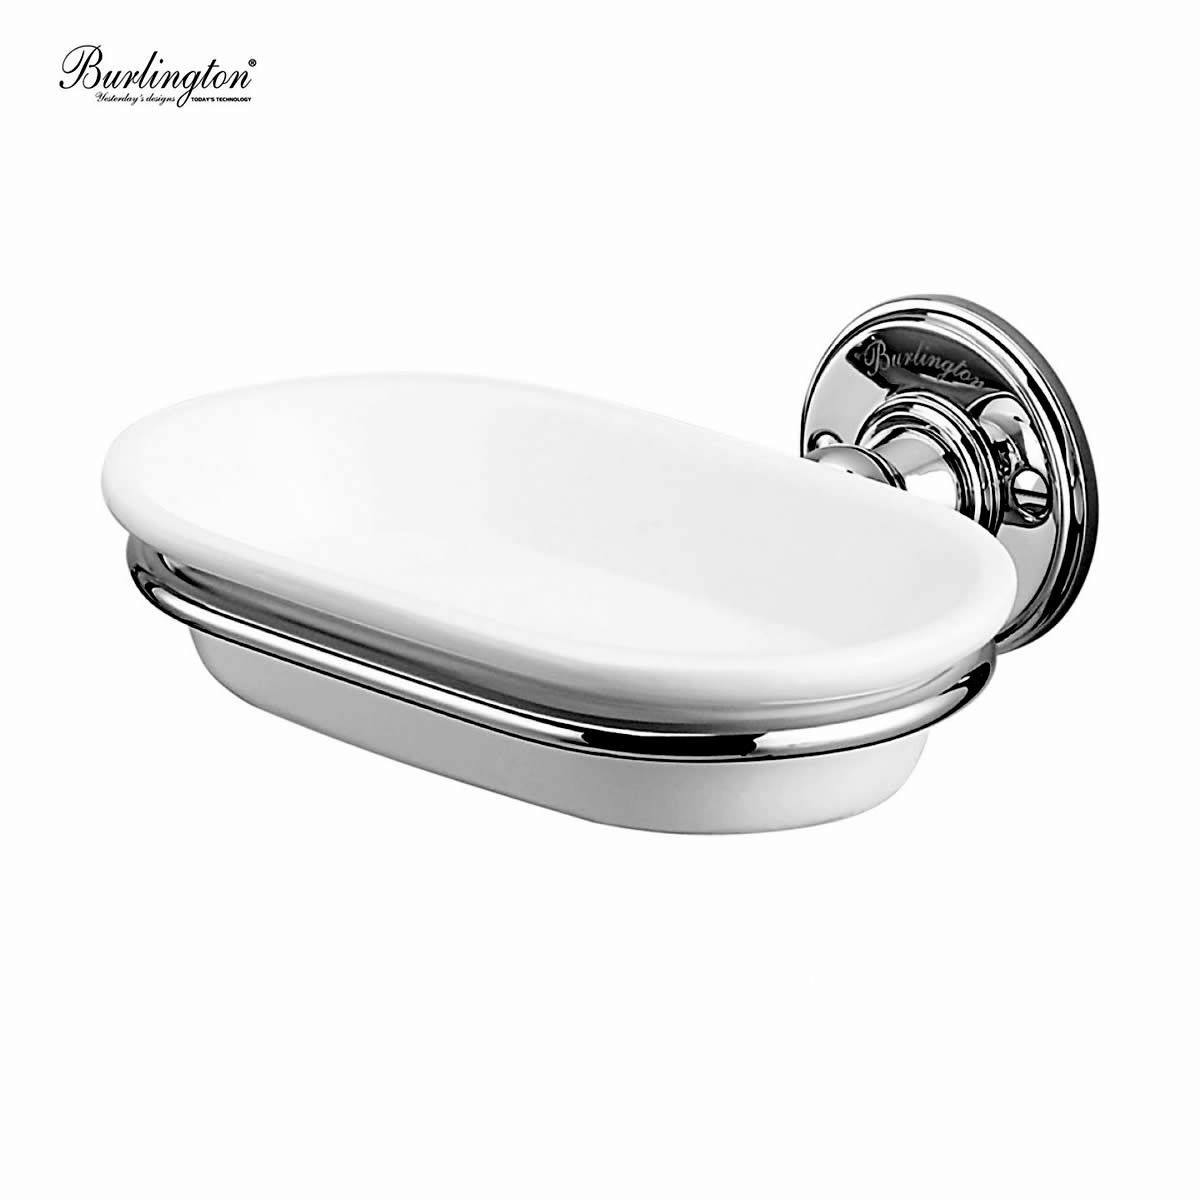 burlington wall mounted soap dish  uk bathrooms - burlington wall mounted soap dish